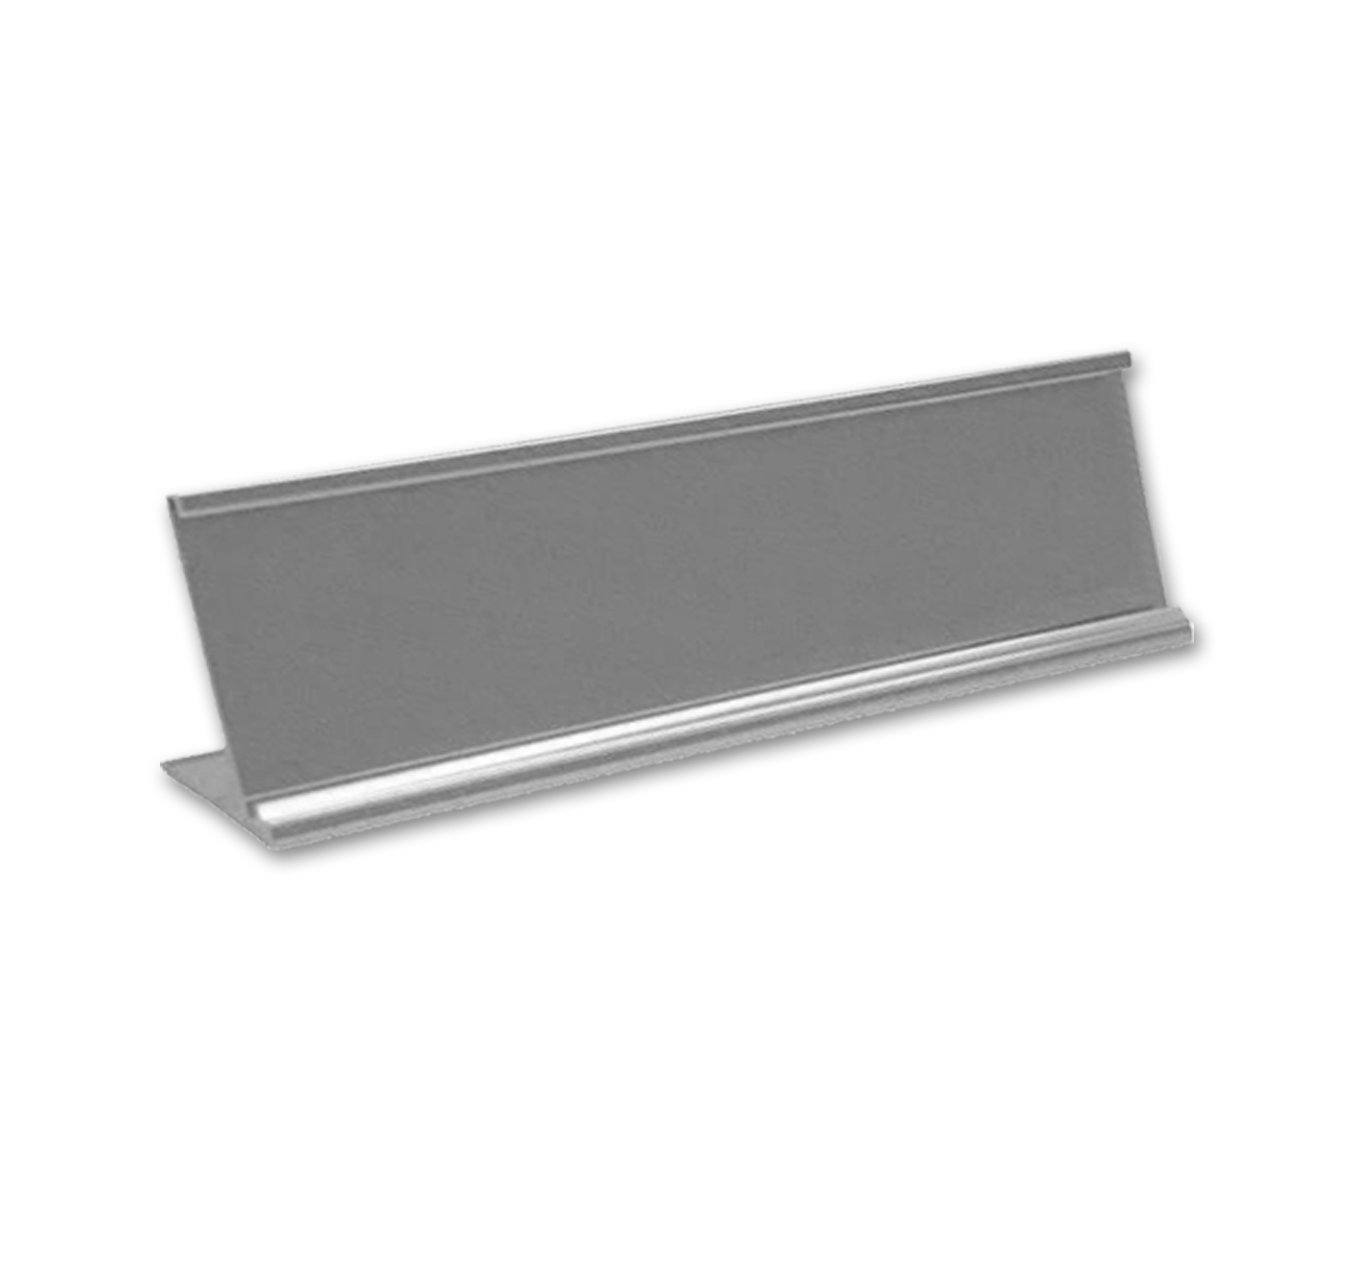 1 10 x 2 Quality Satin Aluminum Desktop Office Nameplate Holder